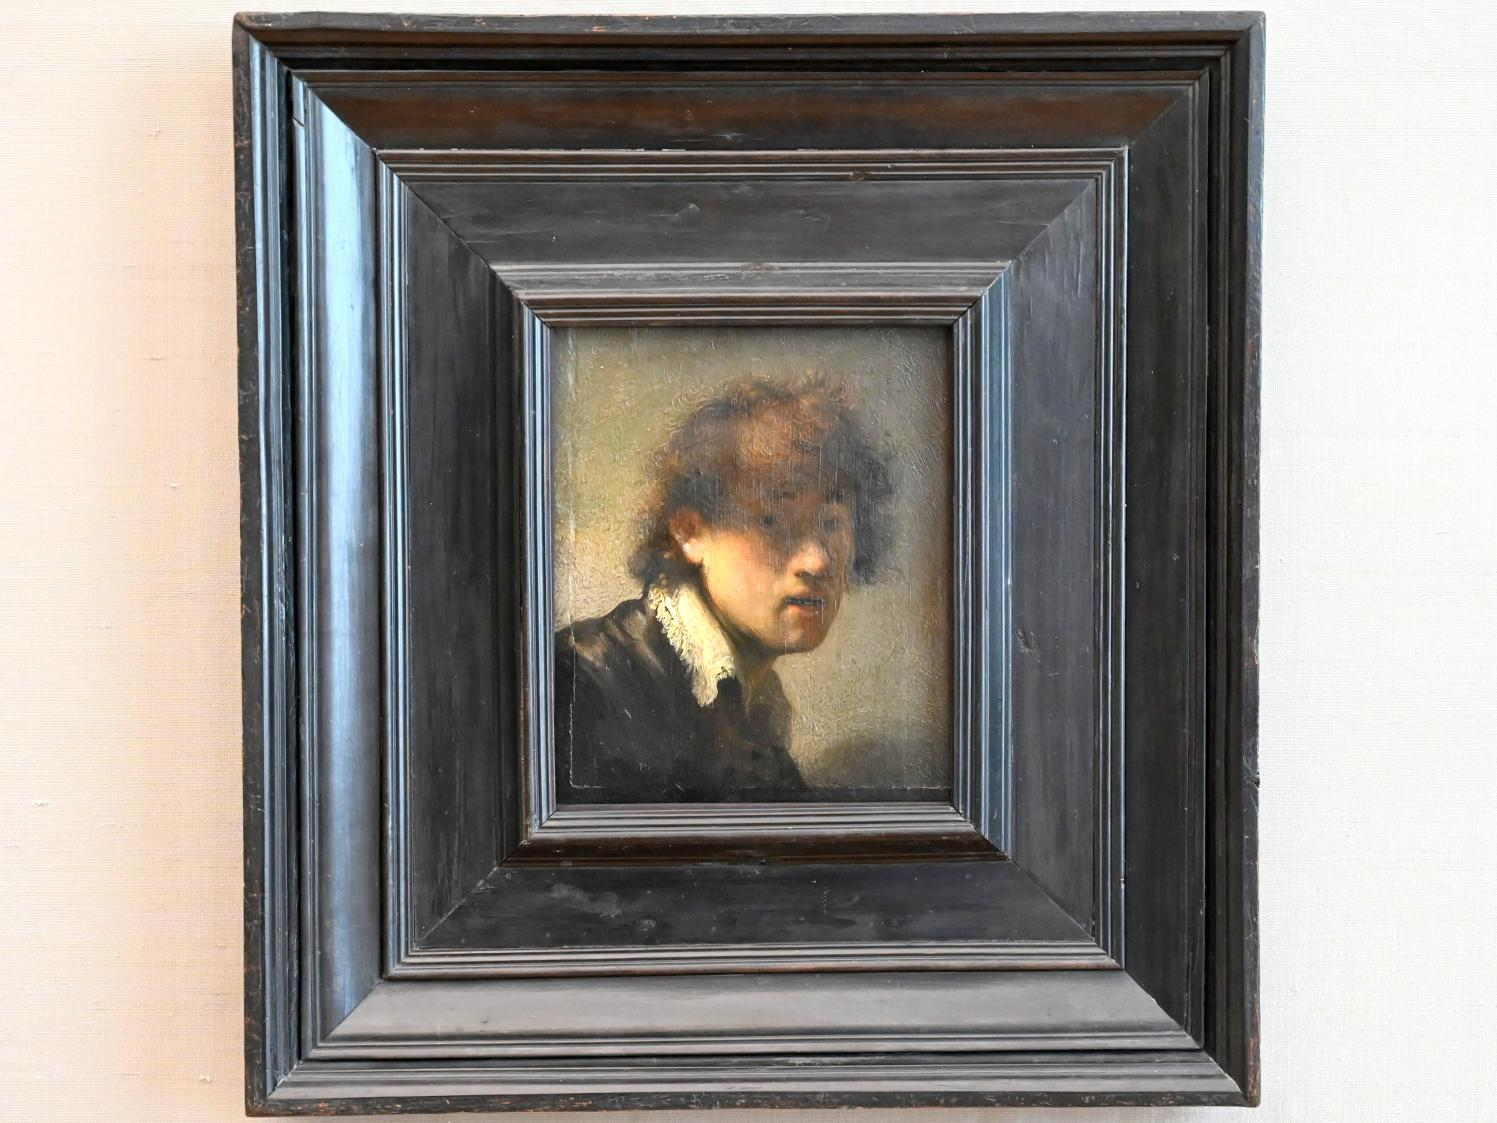 Rembrandt (Rembrandt Harmenszoon van Rijn): Selbstbildnis, 1629